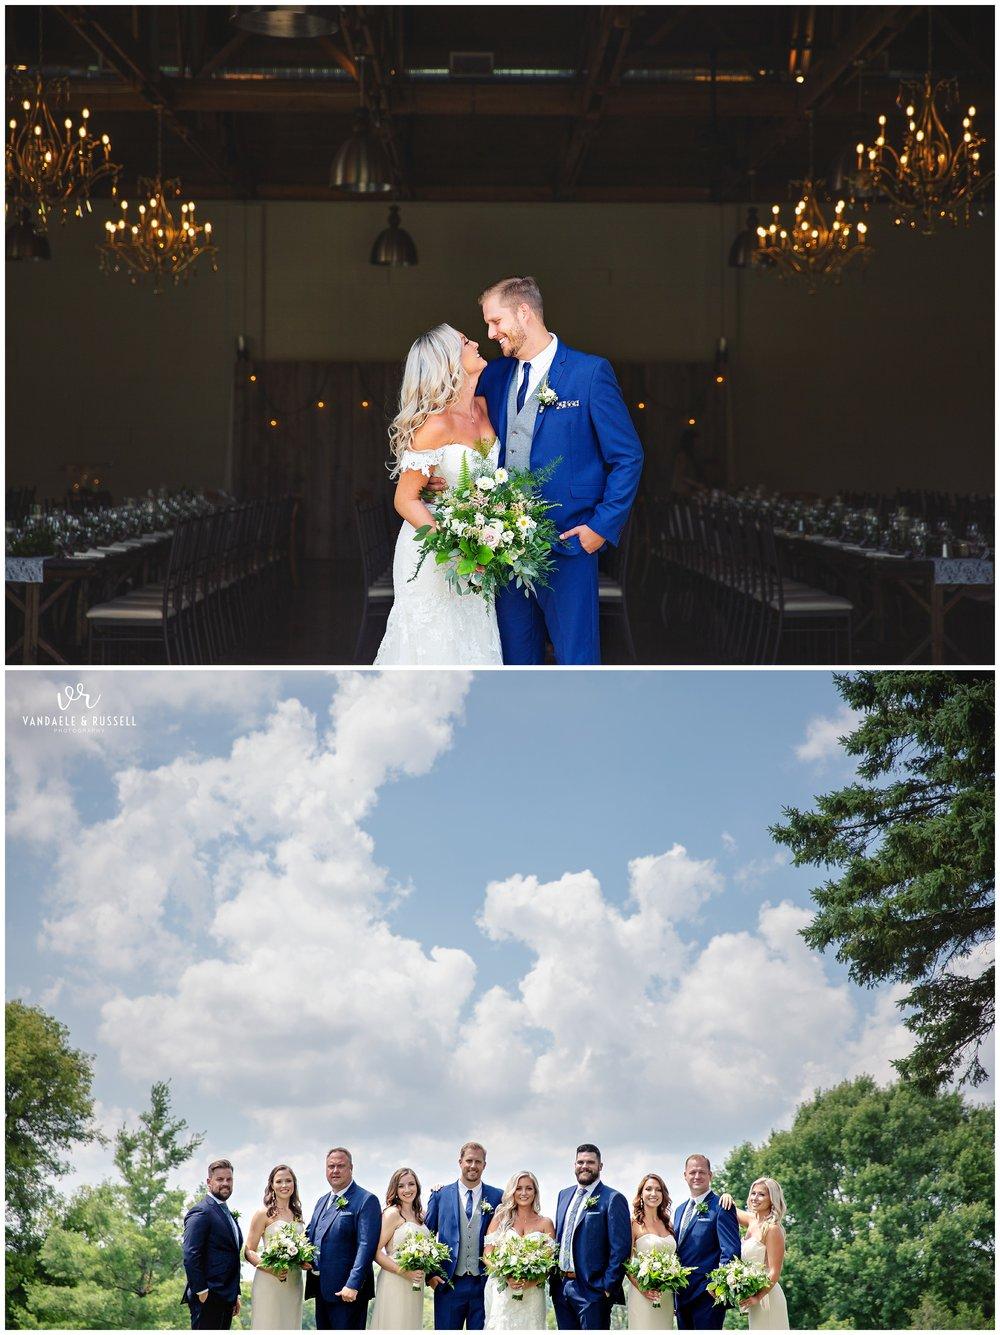 VanDaele-Russell-Wedding-Photography-London-Toronto-Ontario_0153.jpg